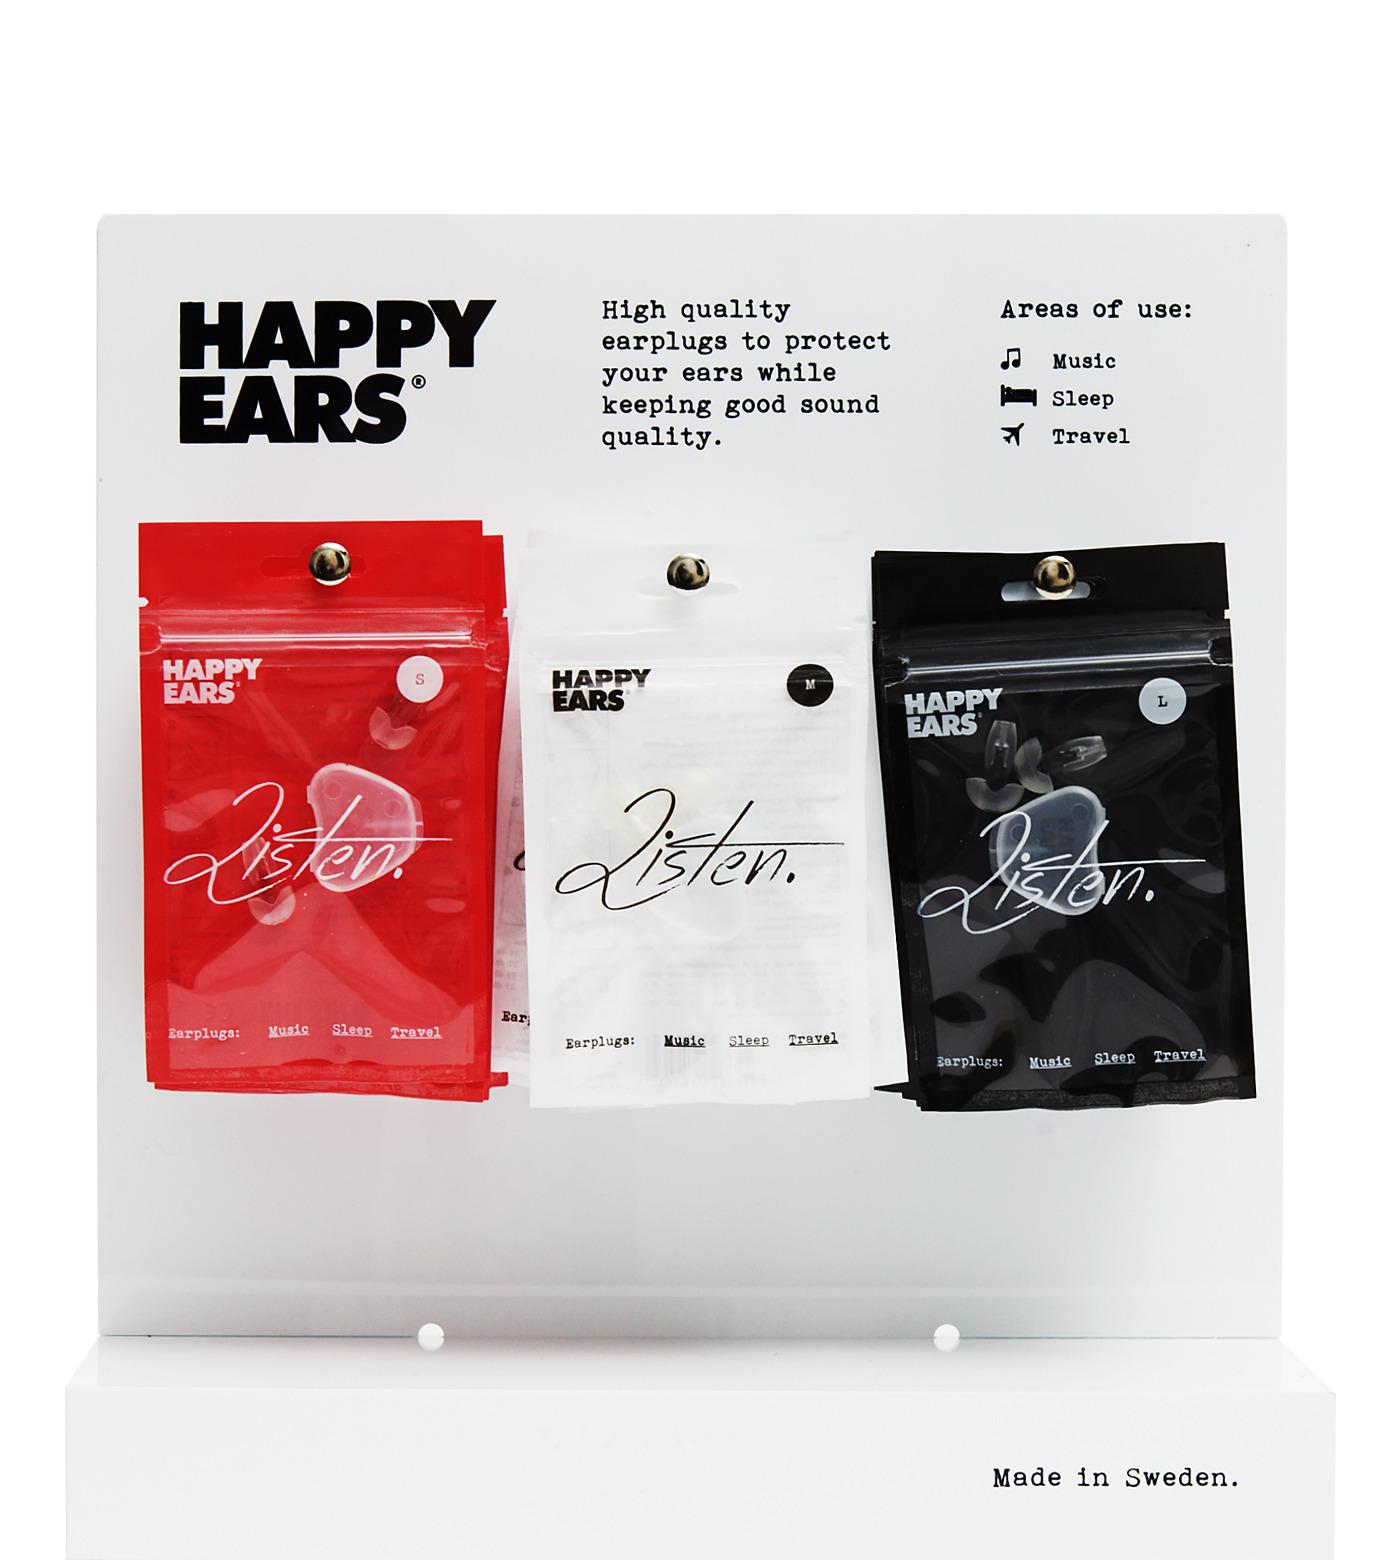 HAPPY EARS(ハッピー イヤーズ)のEAR PLUG2.0 medium-NONE(ガジェット/gadgets)-Earplug-m-0 拡大詳細画像3